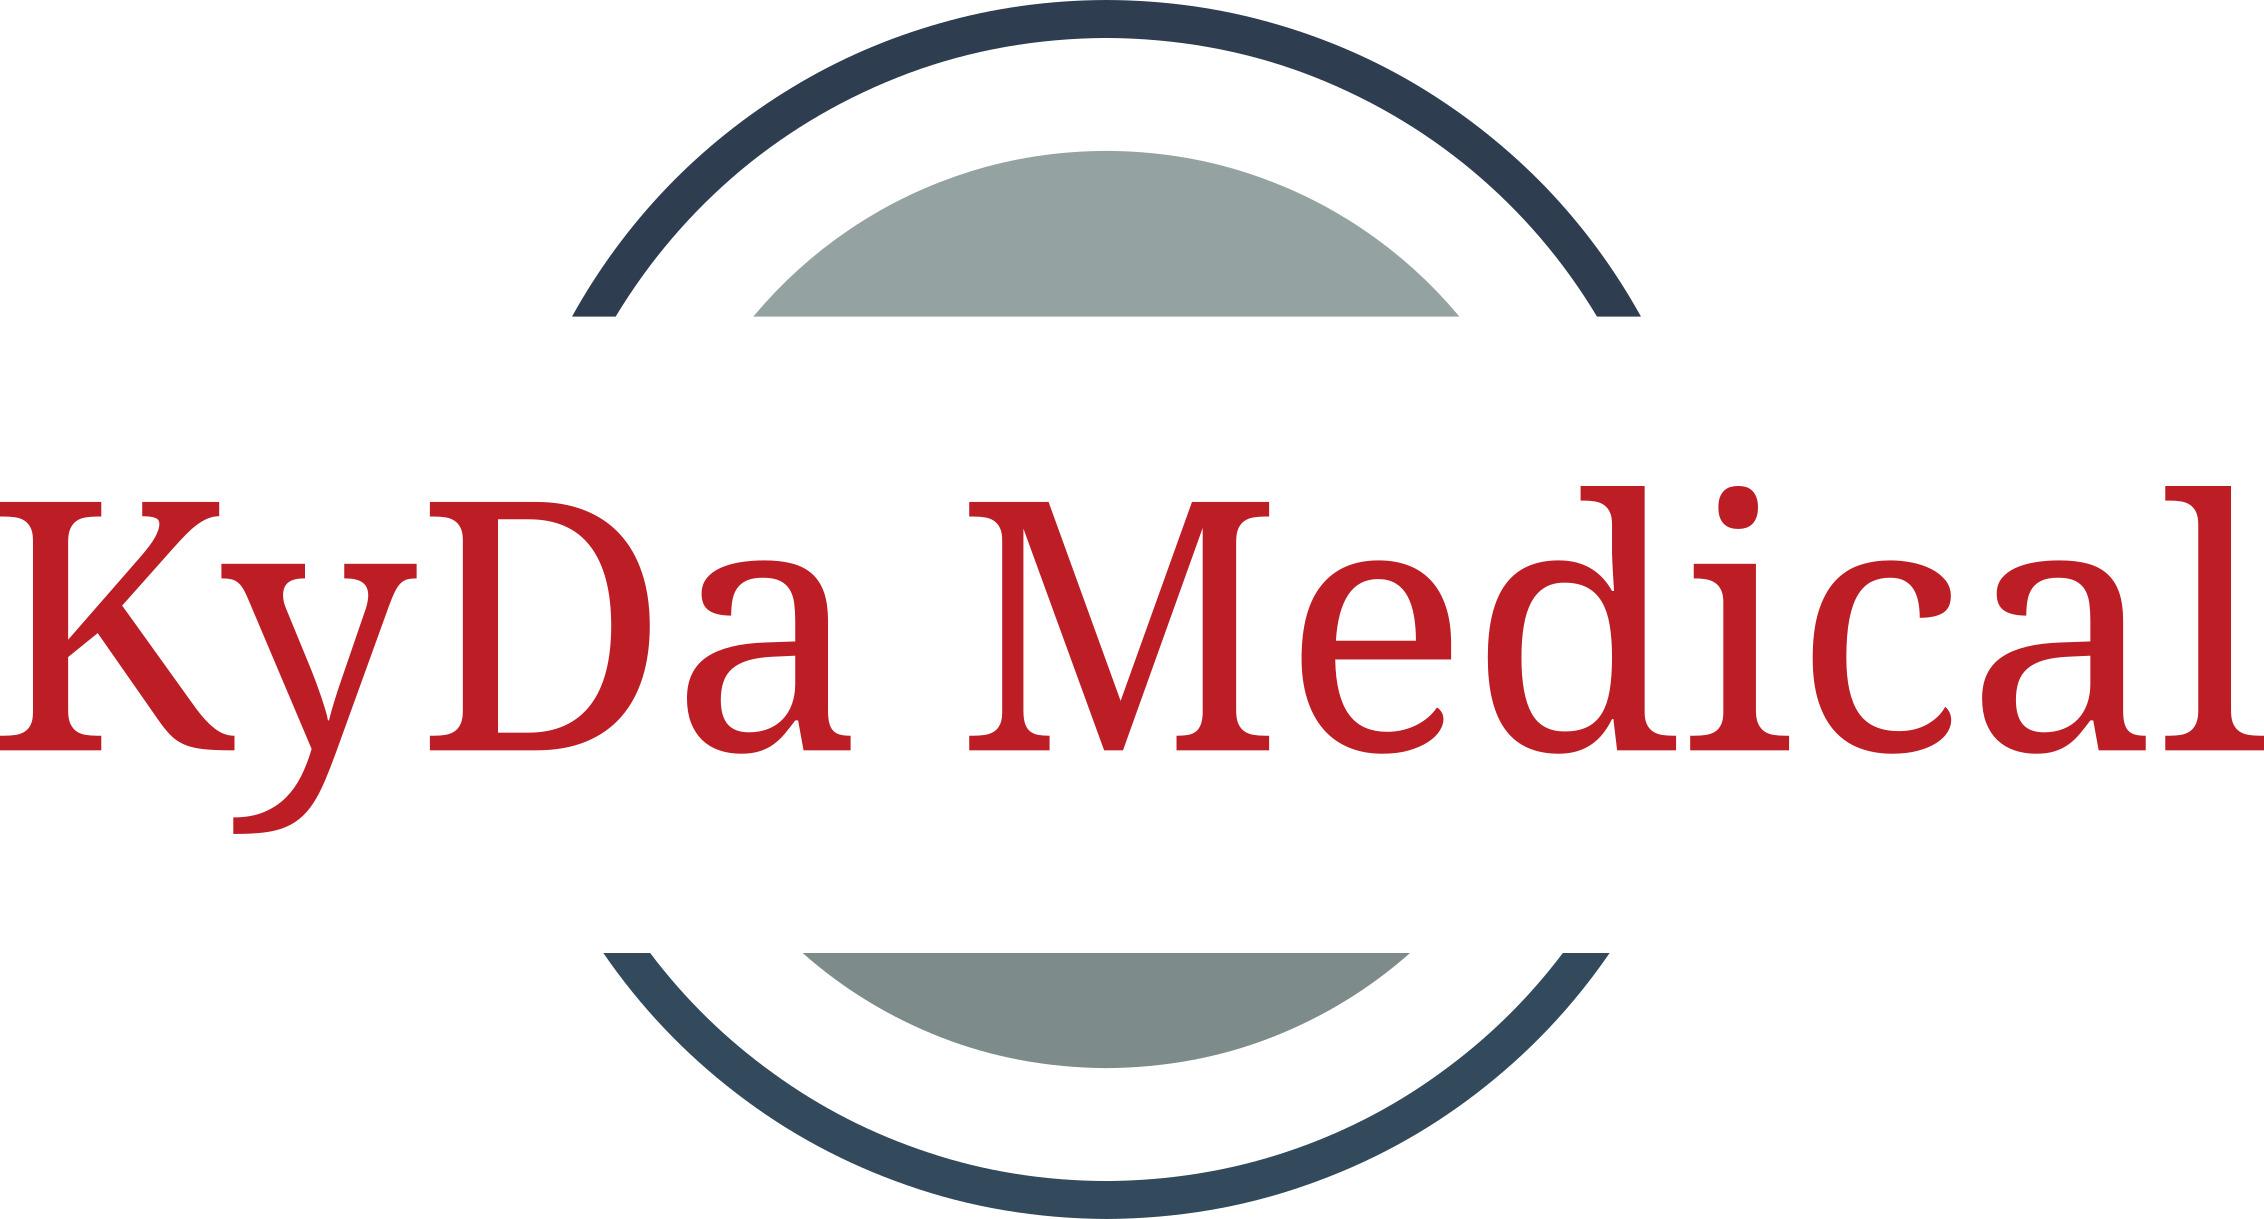 KyDa Medical